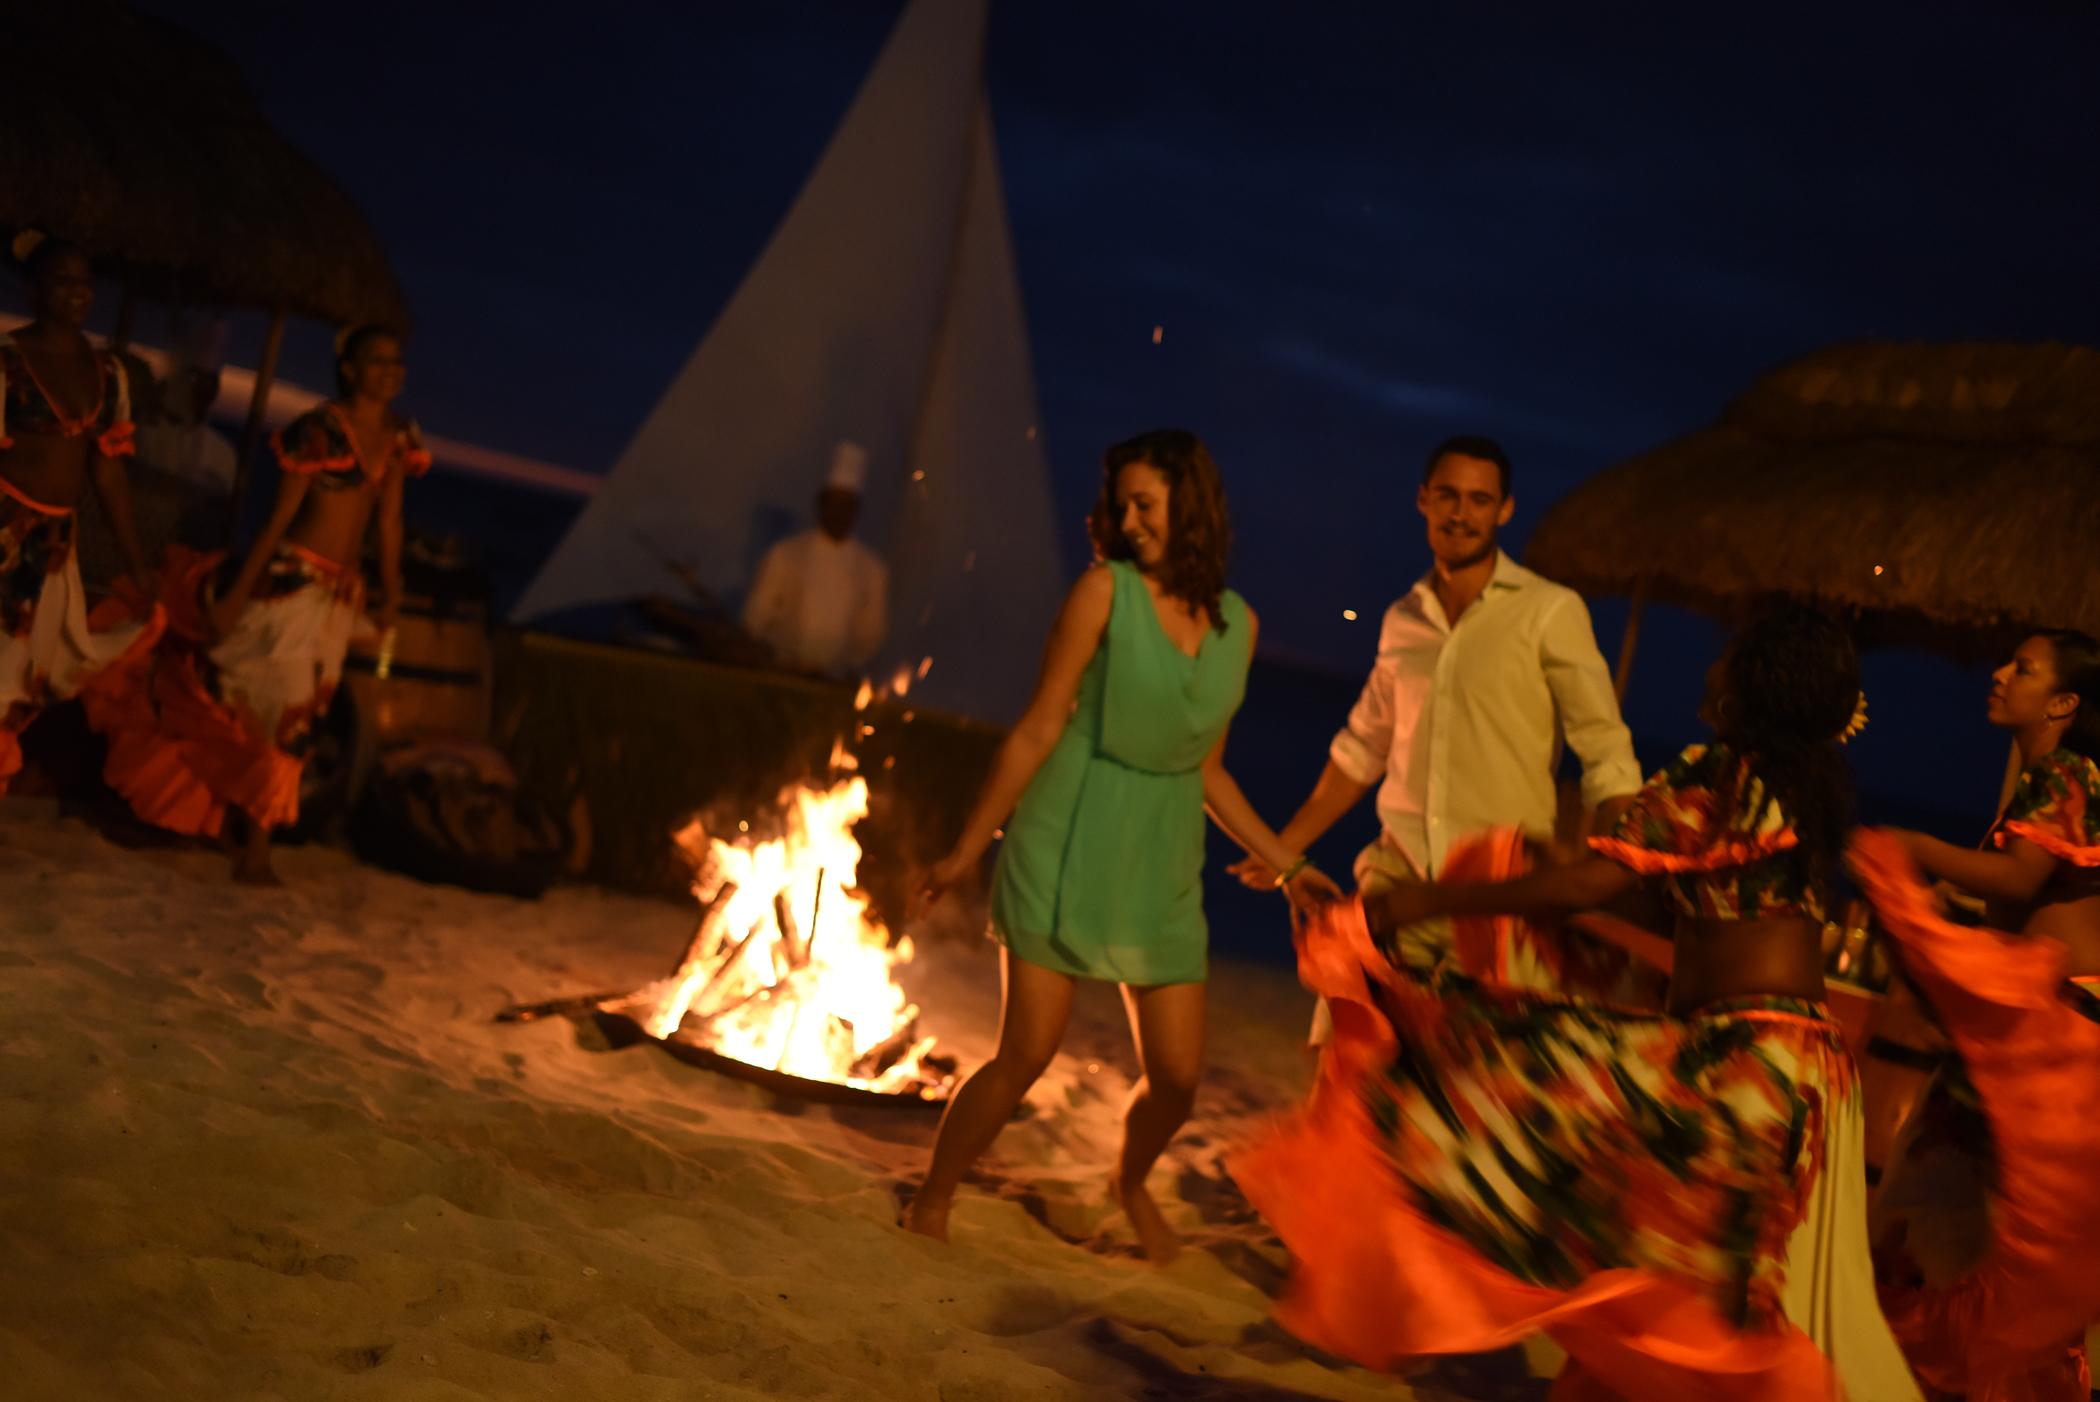 La_Pirogue_Fishermen_s_Night_7-2100x1402-601b683e-6827-4b02-af89-a88426c4103f.jpg